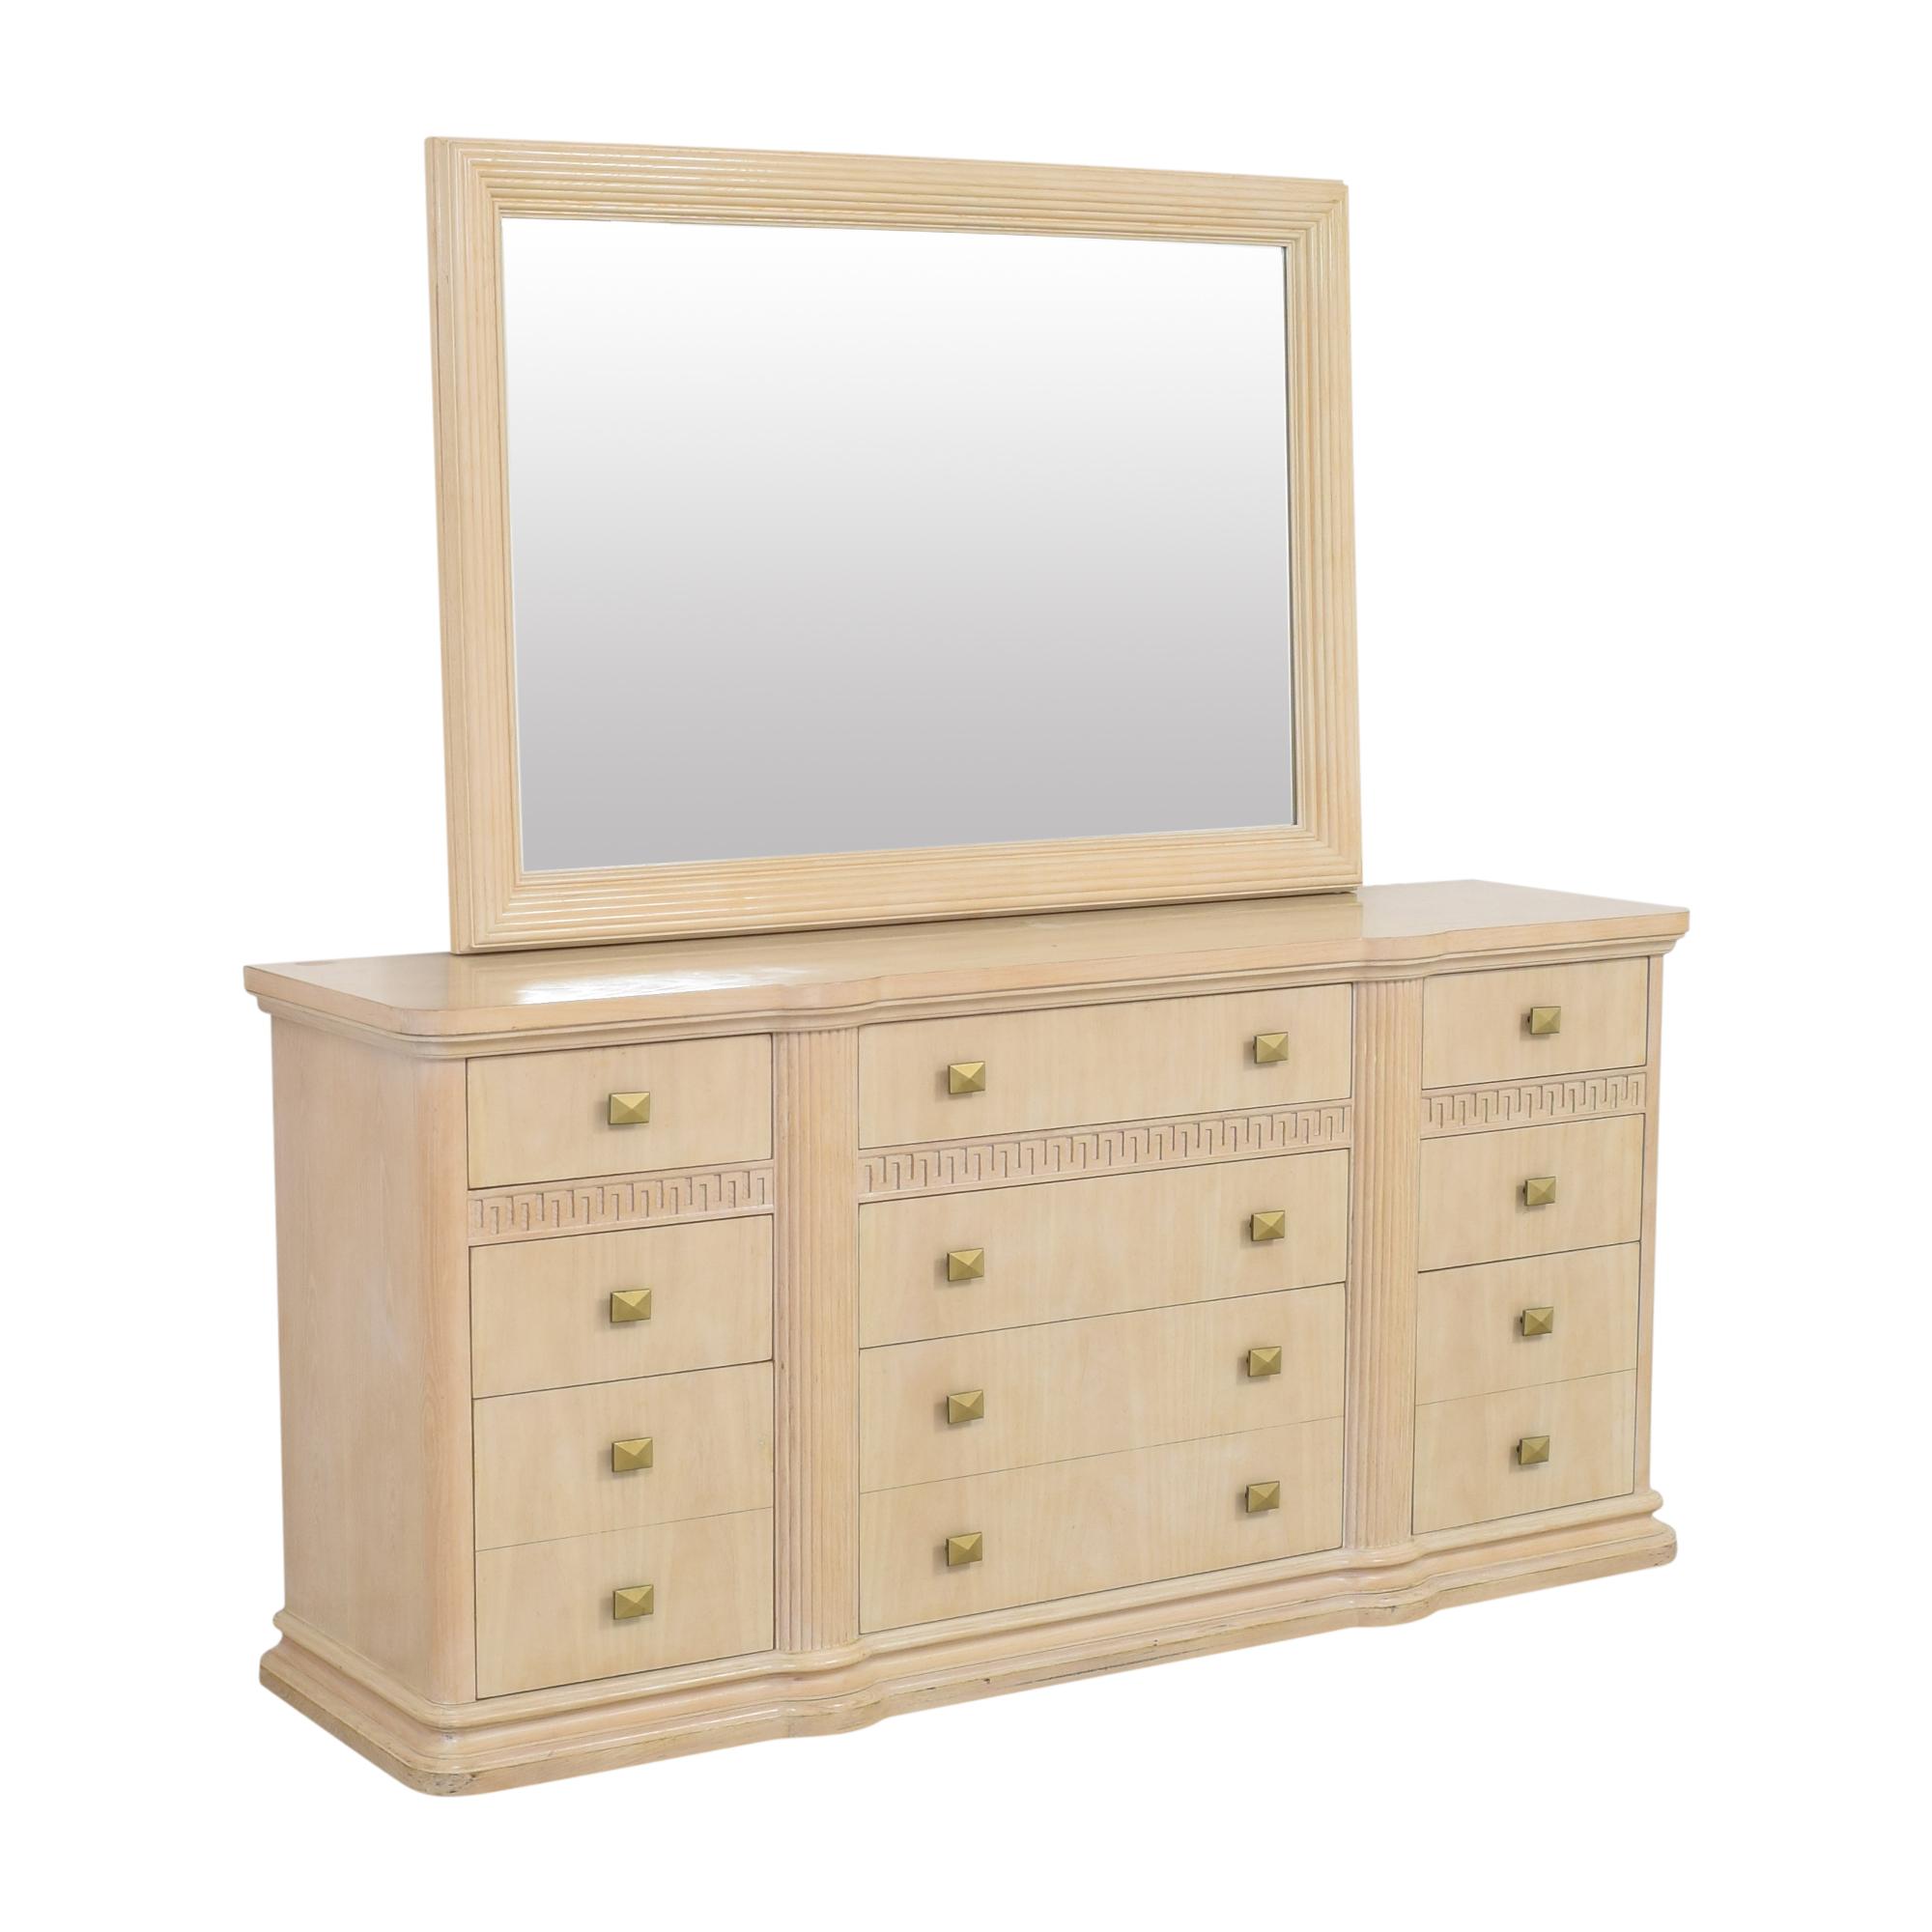 buy Drexel Heritage Wide Dresser with Mirror Drexel Heritage Storage